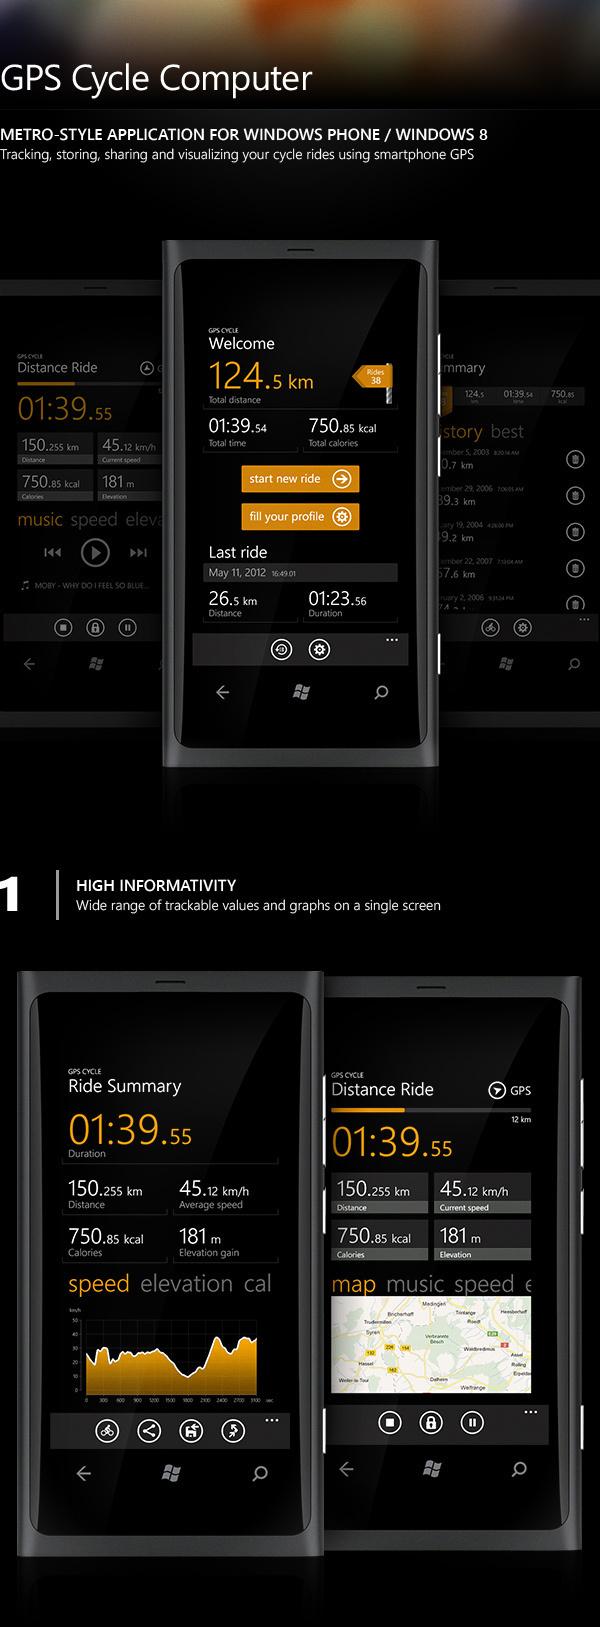 GPS Cycle (Metro application) on Behance #cycle #app #windows #metro